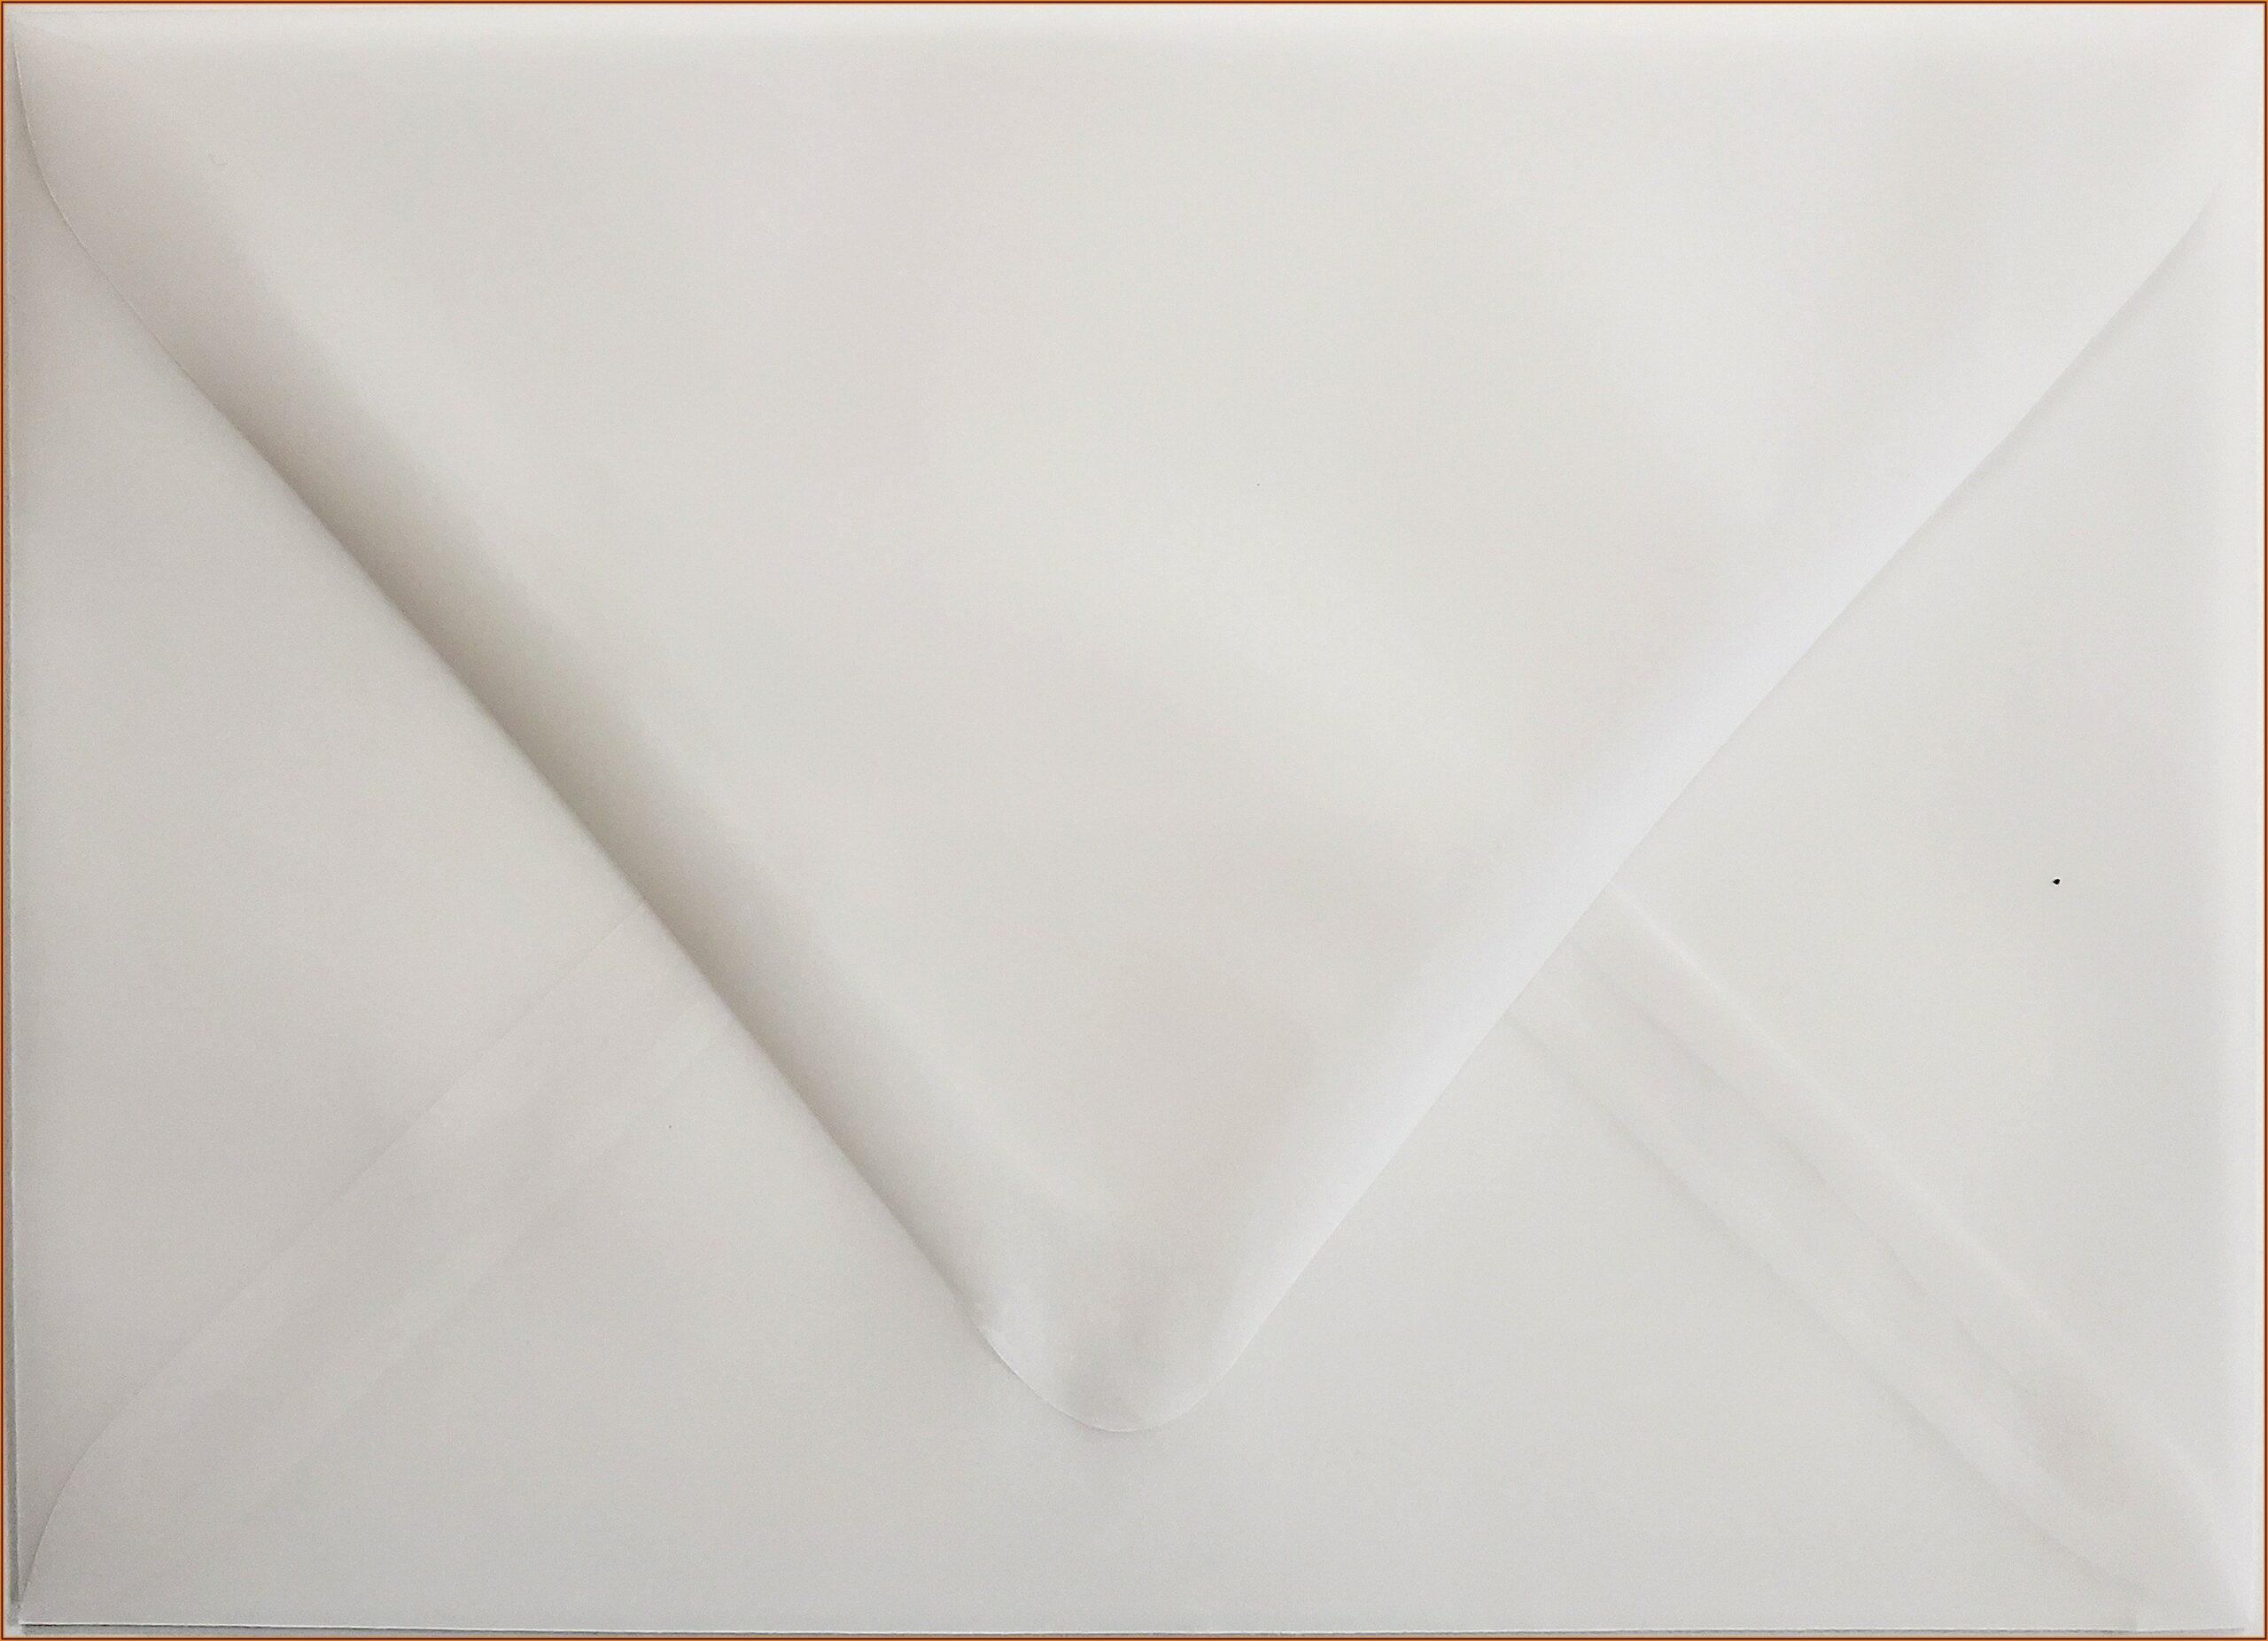 4 34 X 7 12 Envelopes